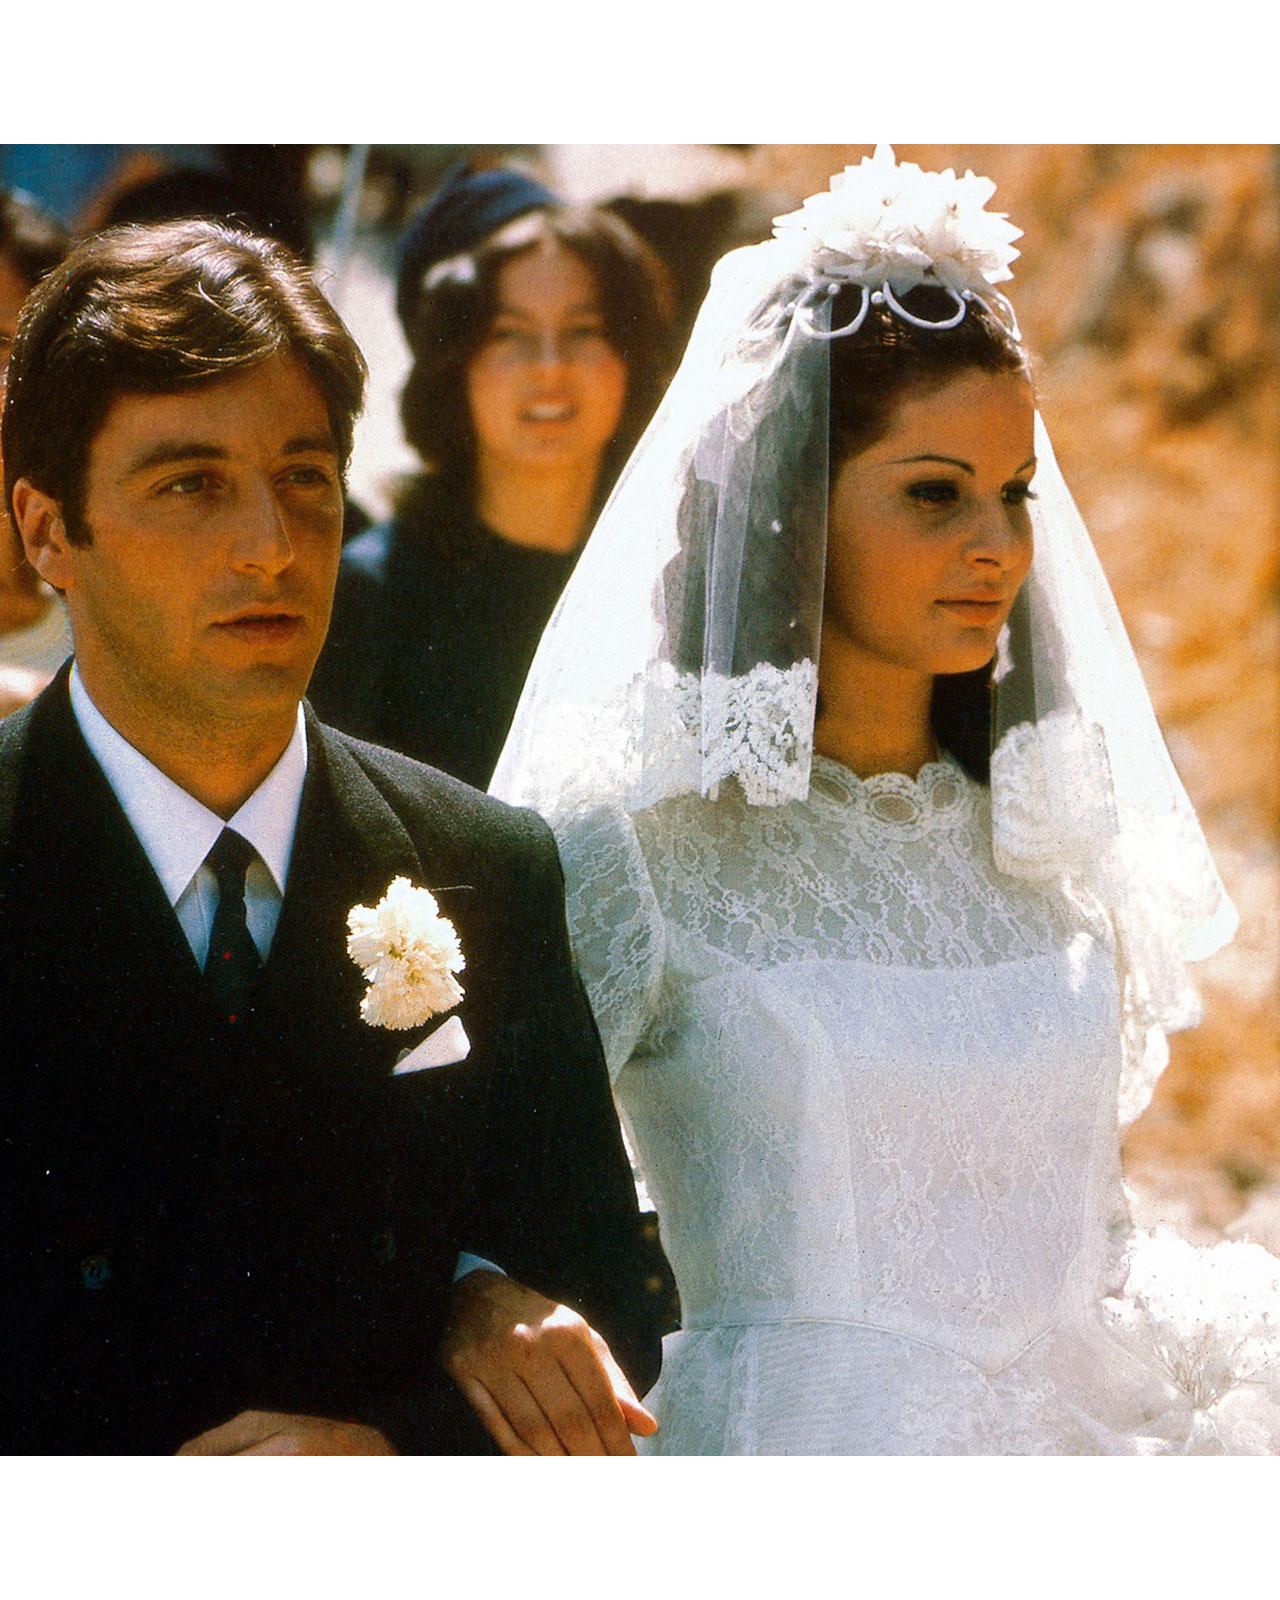 movie-wedding-dresses-the-godfather-simonetta-stefanelli-0316.jpg